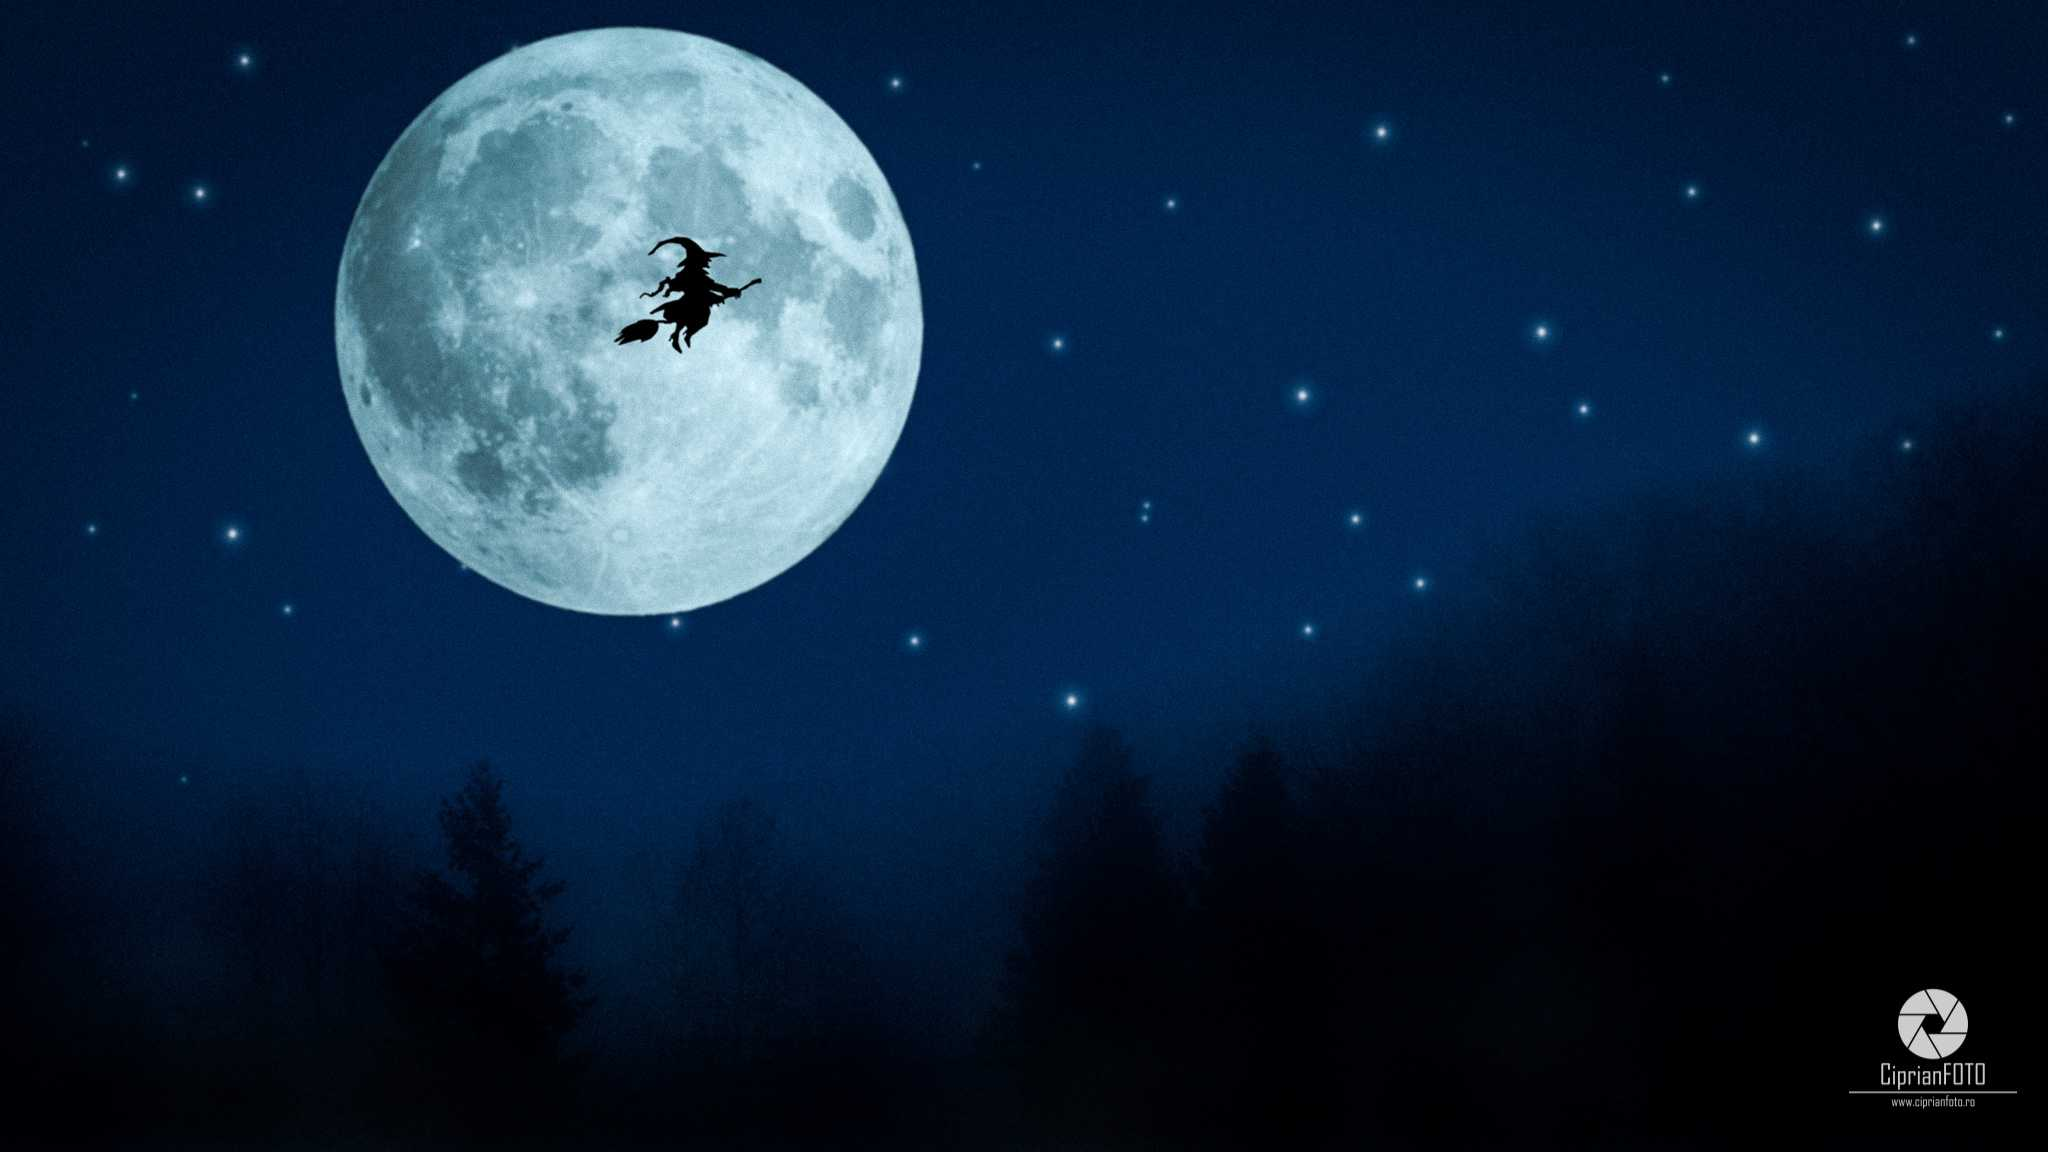 Flying Witch, Photoshop Manipulation Tutorial, CiprianFOTO